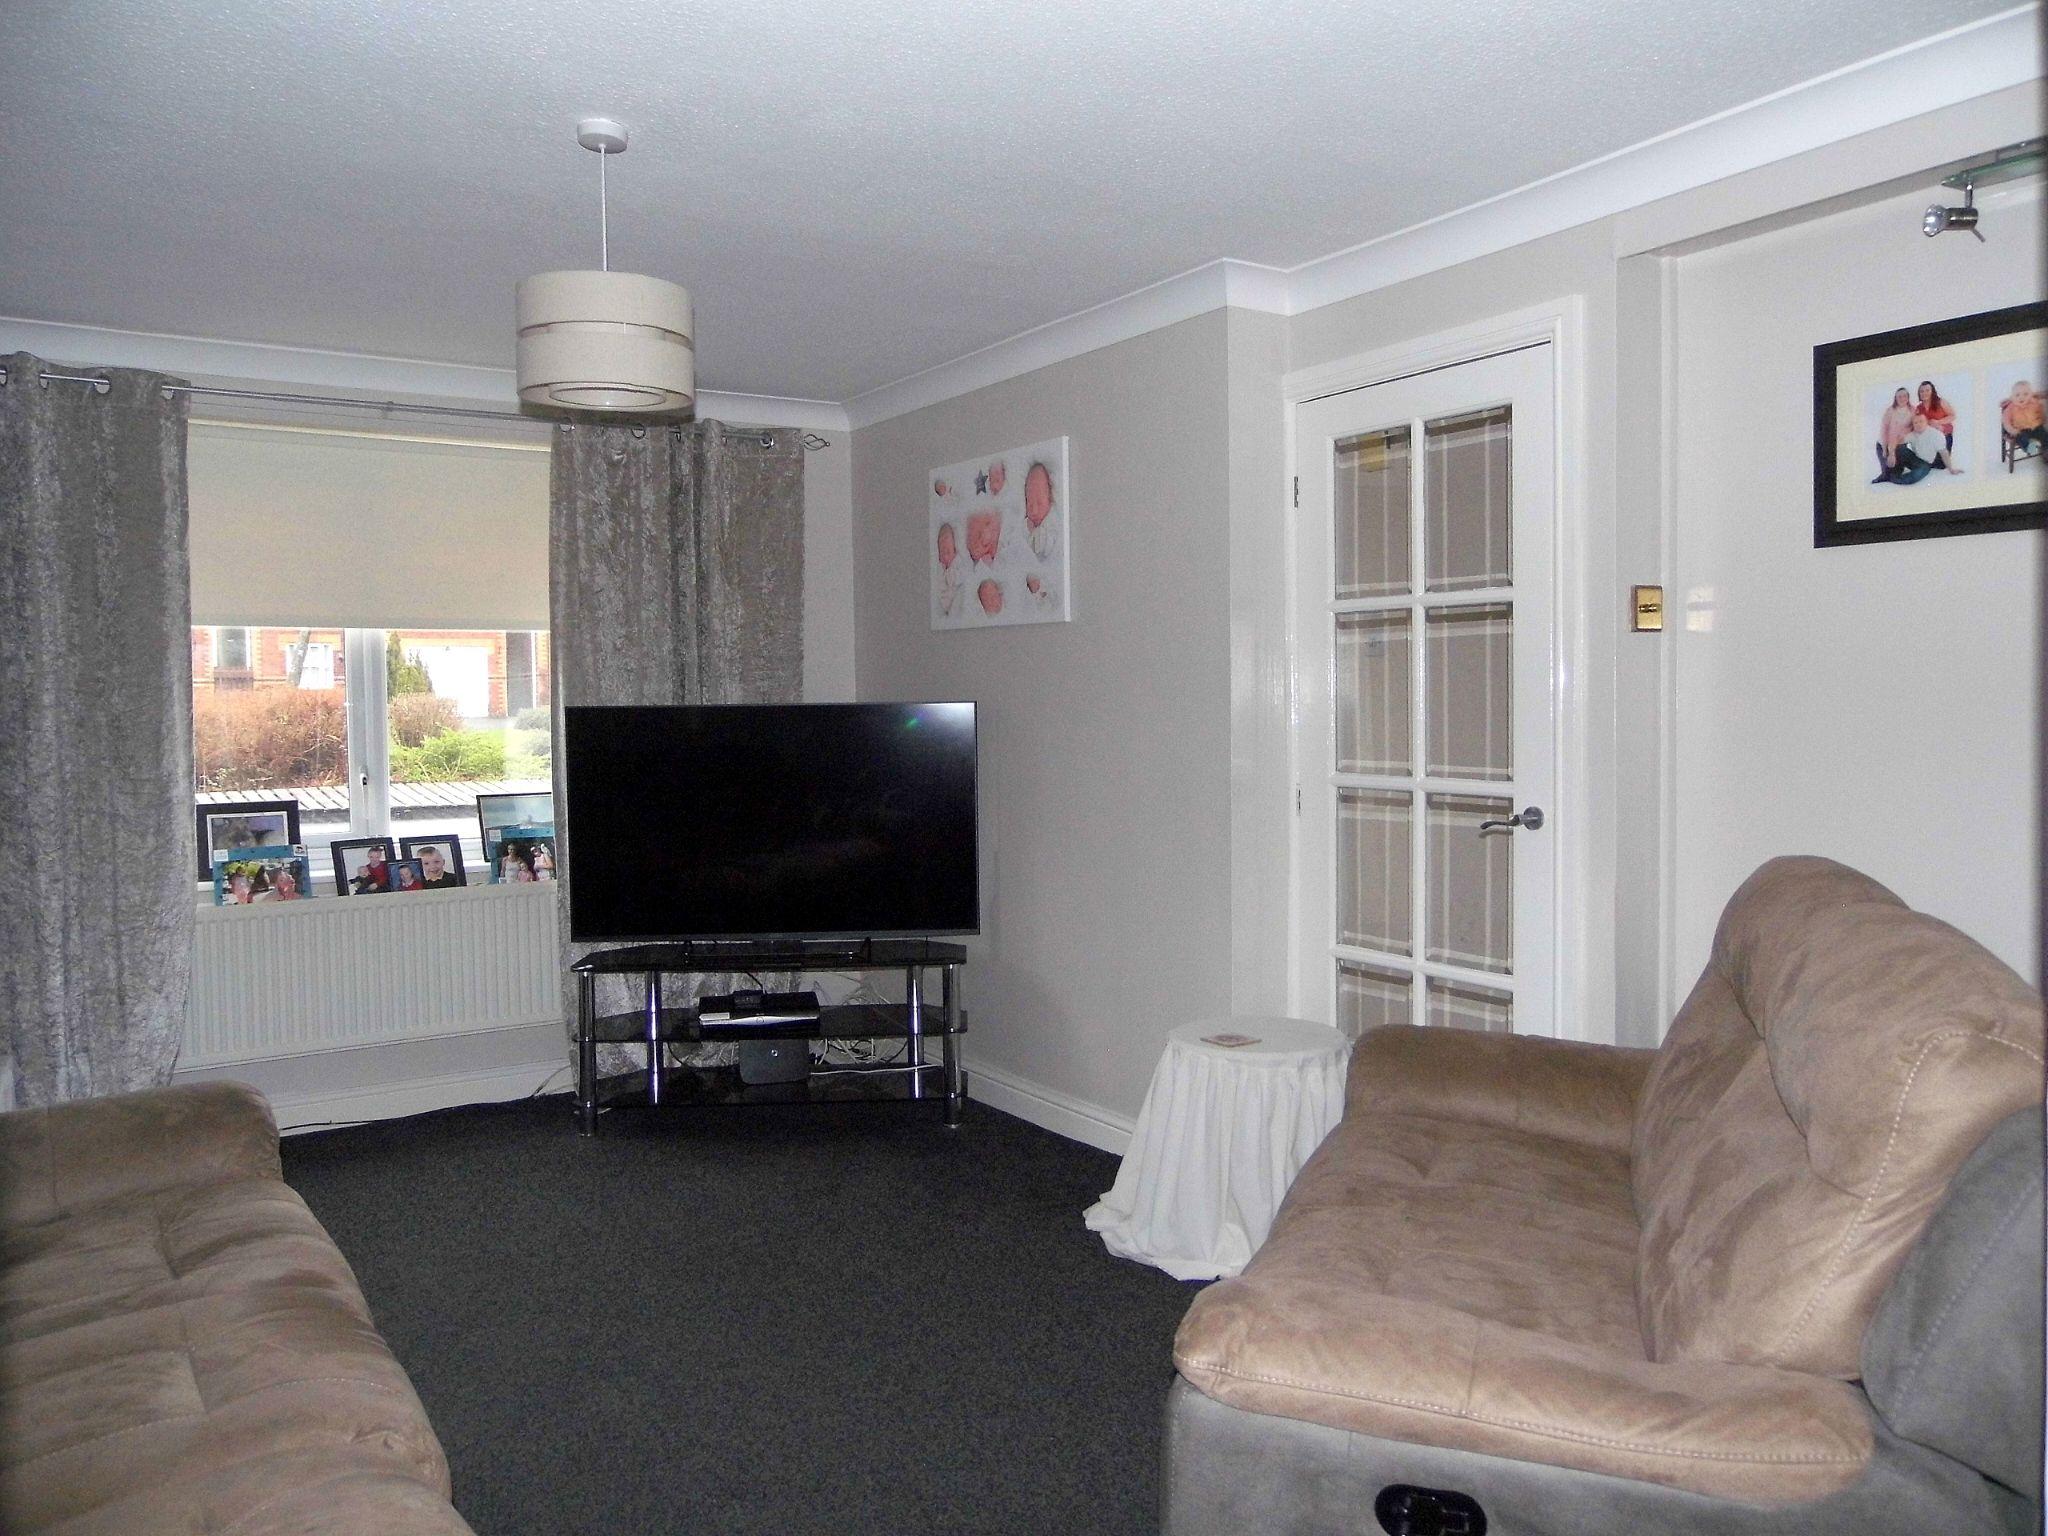 4 bedroom detached house SSTC in Bishop Auckland - Lounge.